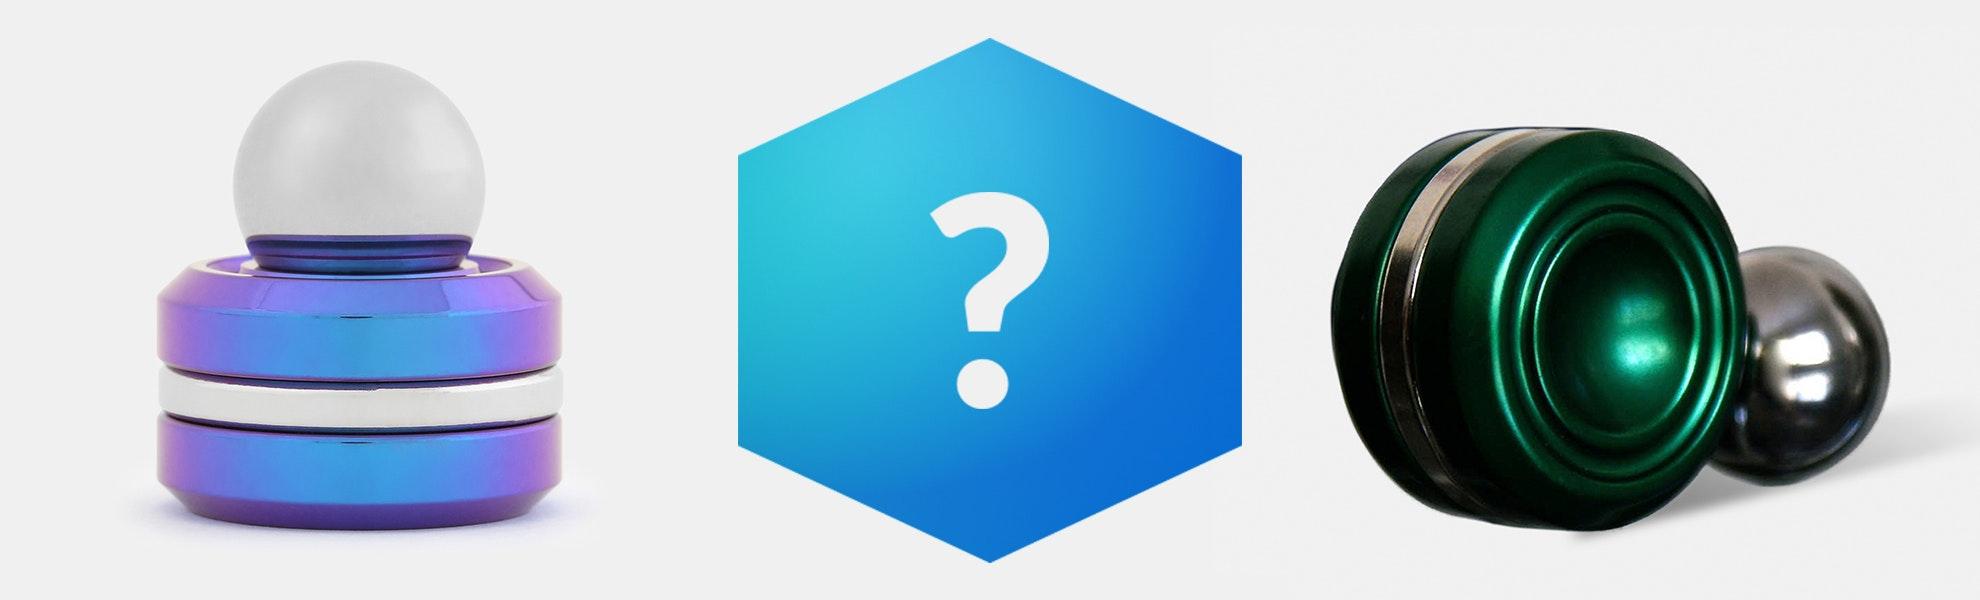 Massdrop Blue Box: TEC Accessories Orbiter Spinner